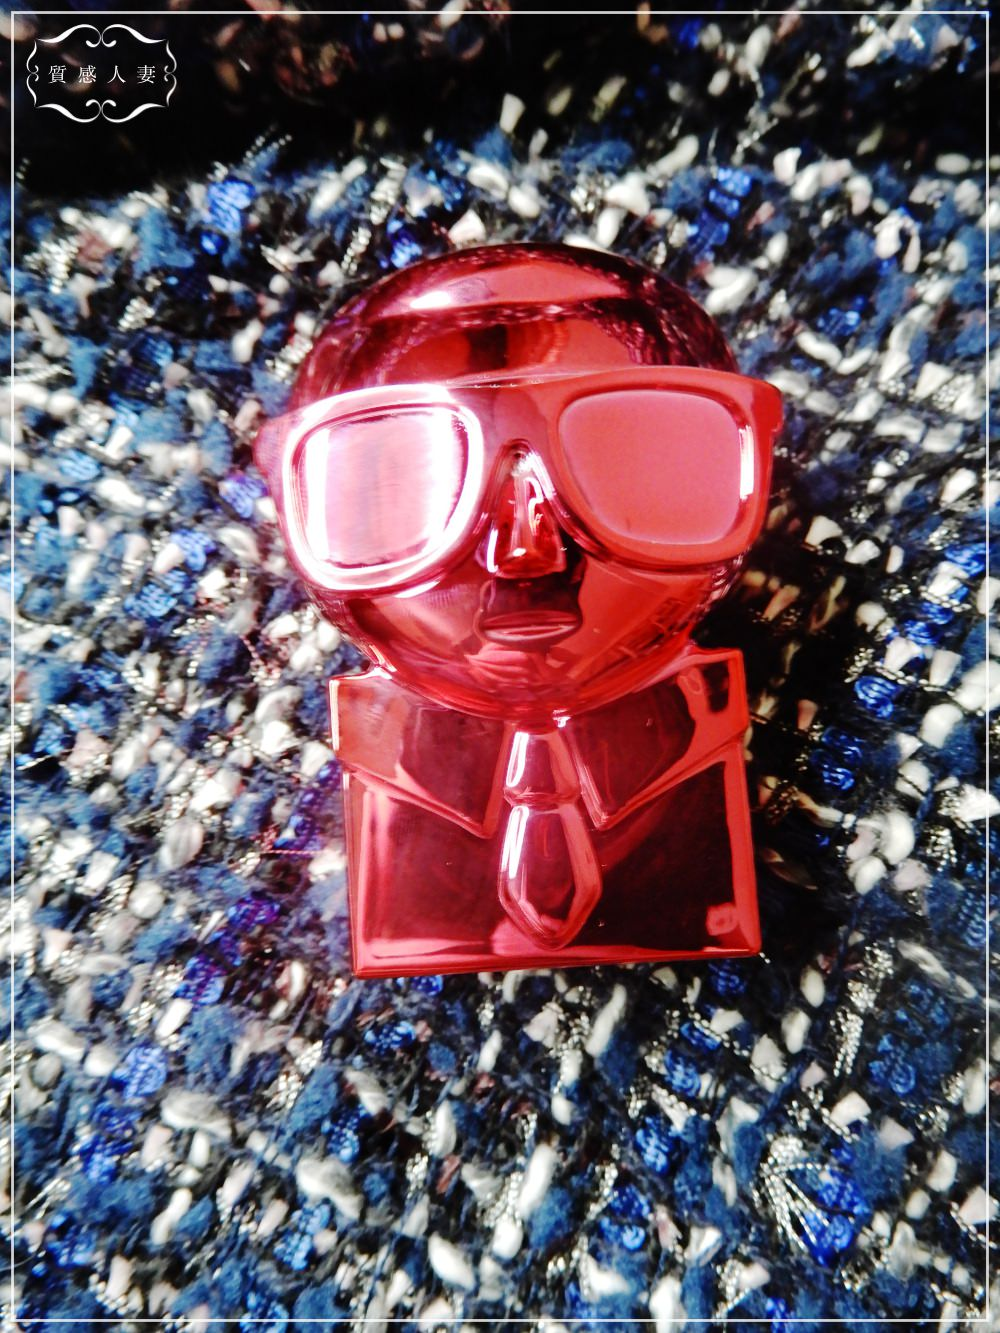 Cult Beauty開箱特輯。KARL LAGERFELD + MODELCO 護唇膏跟脣膏彩妝才兩百多台幣啊(上集)